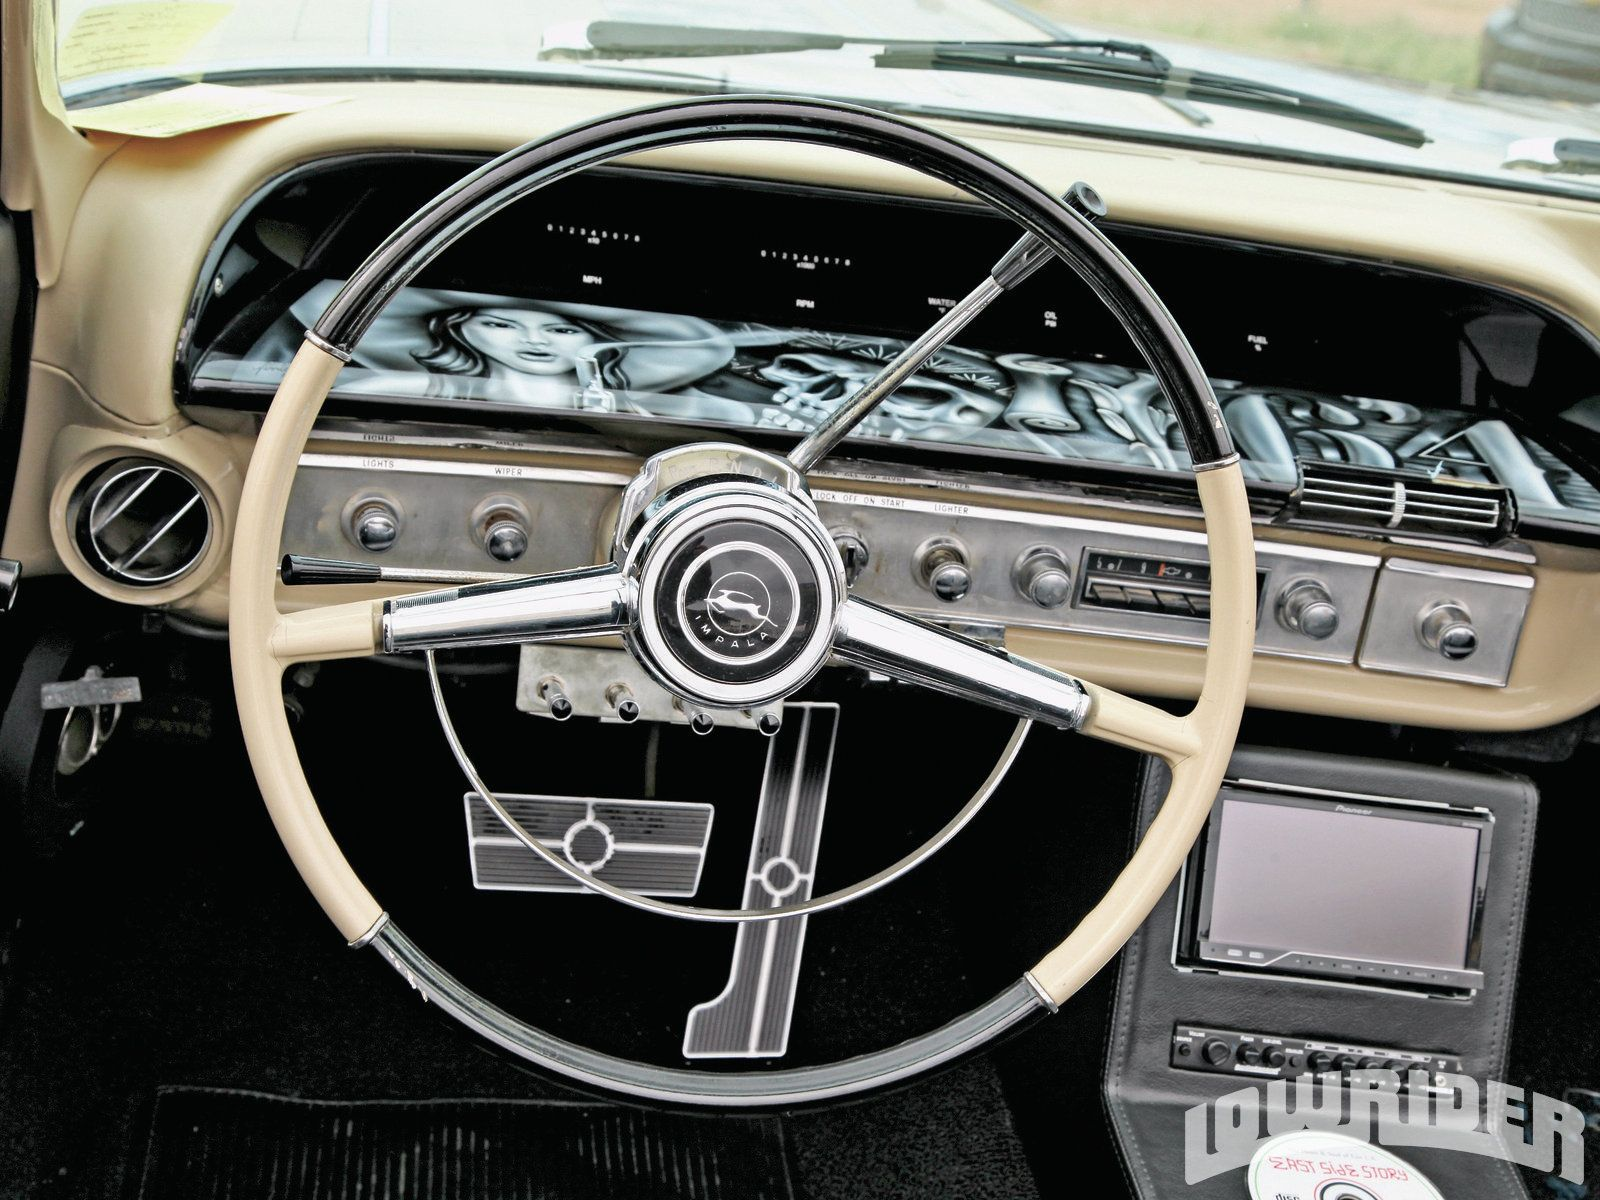 1964 Chevrolet Impala Dakota Digital Dash 1964 Impala